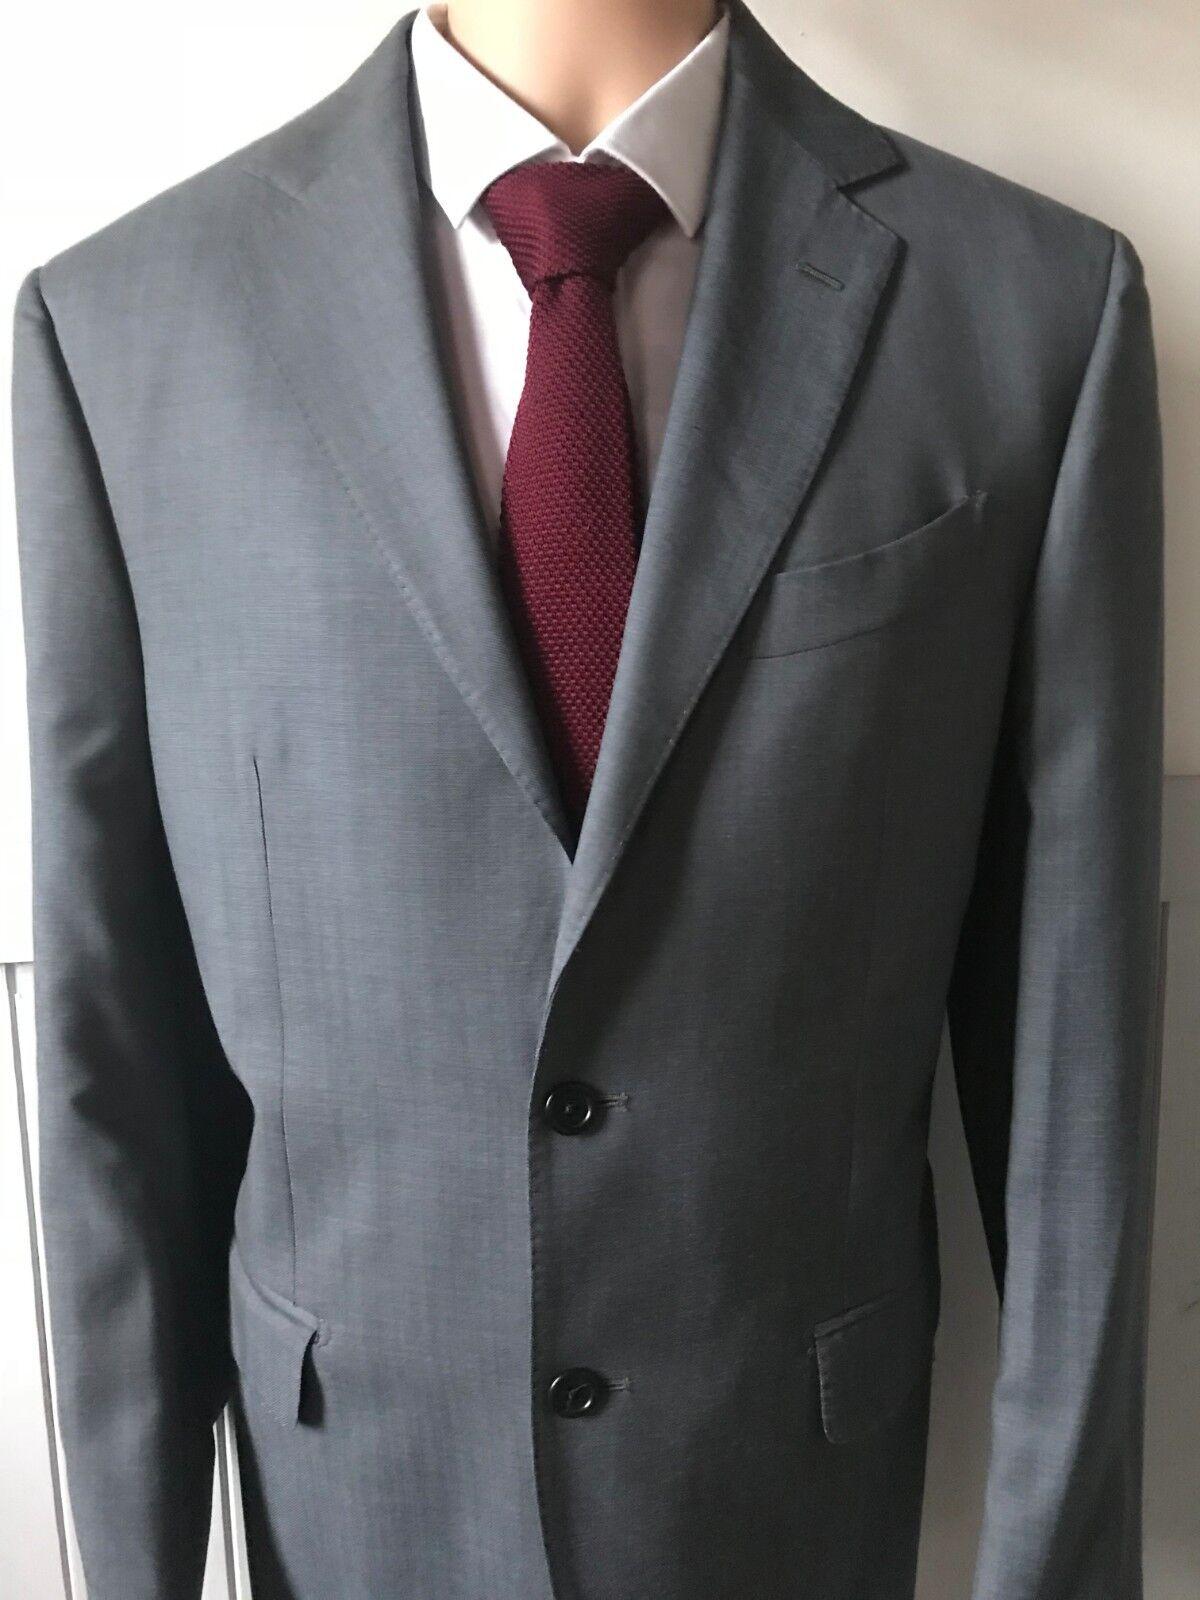 Versace V1969  Herren suit light Blau Grau slim fit IT52 42c 34w VGC